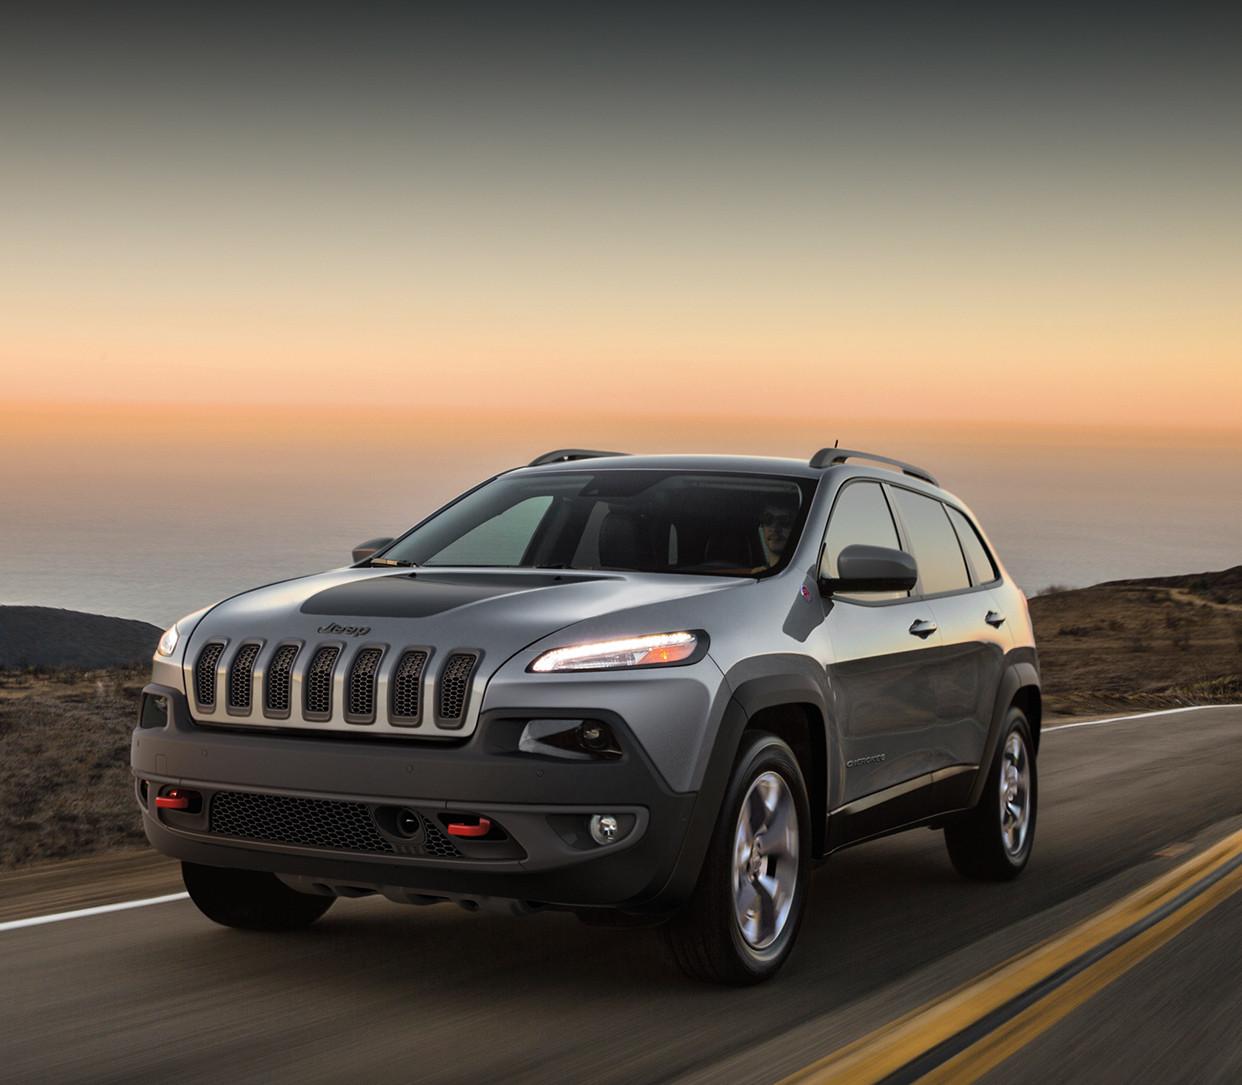 Jeep Cheroker: 2018 Jeep Cherokee 4x4